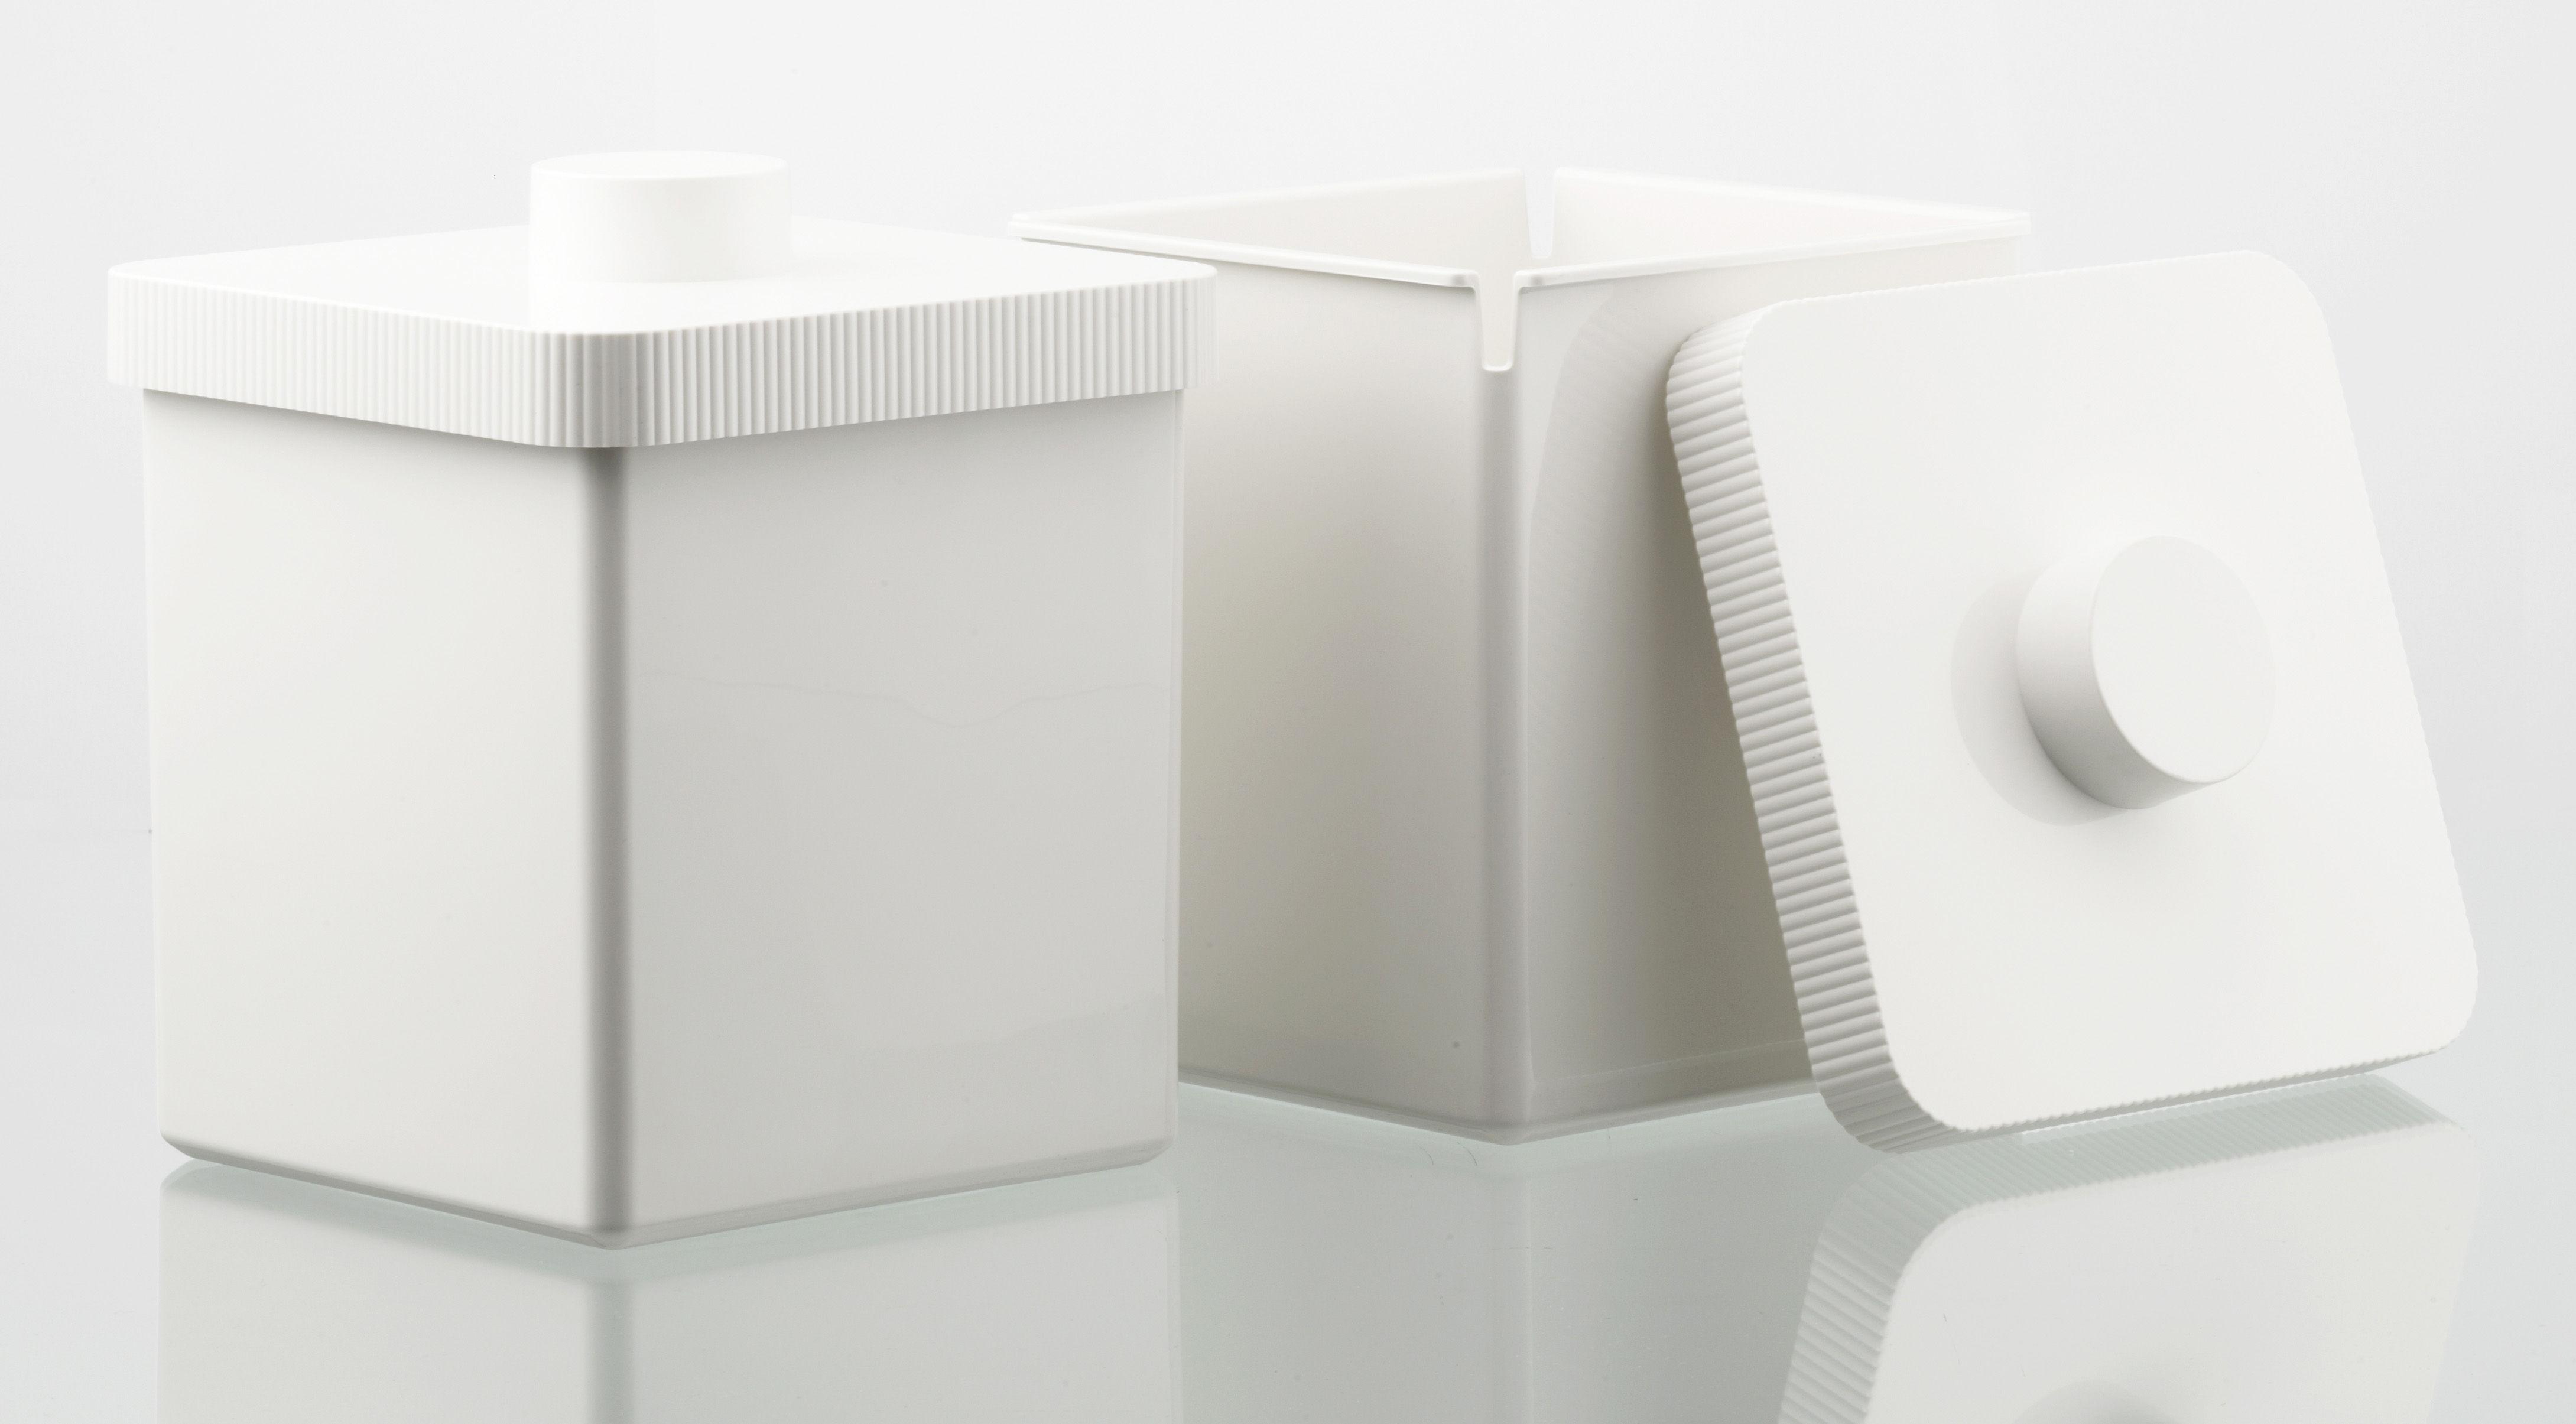 poubelle kali 10 litres blanc authentics made in design. Black Bedroom Furniture Sets. Home Design Ideas